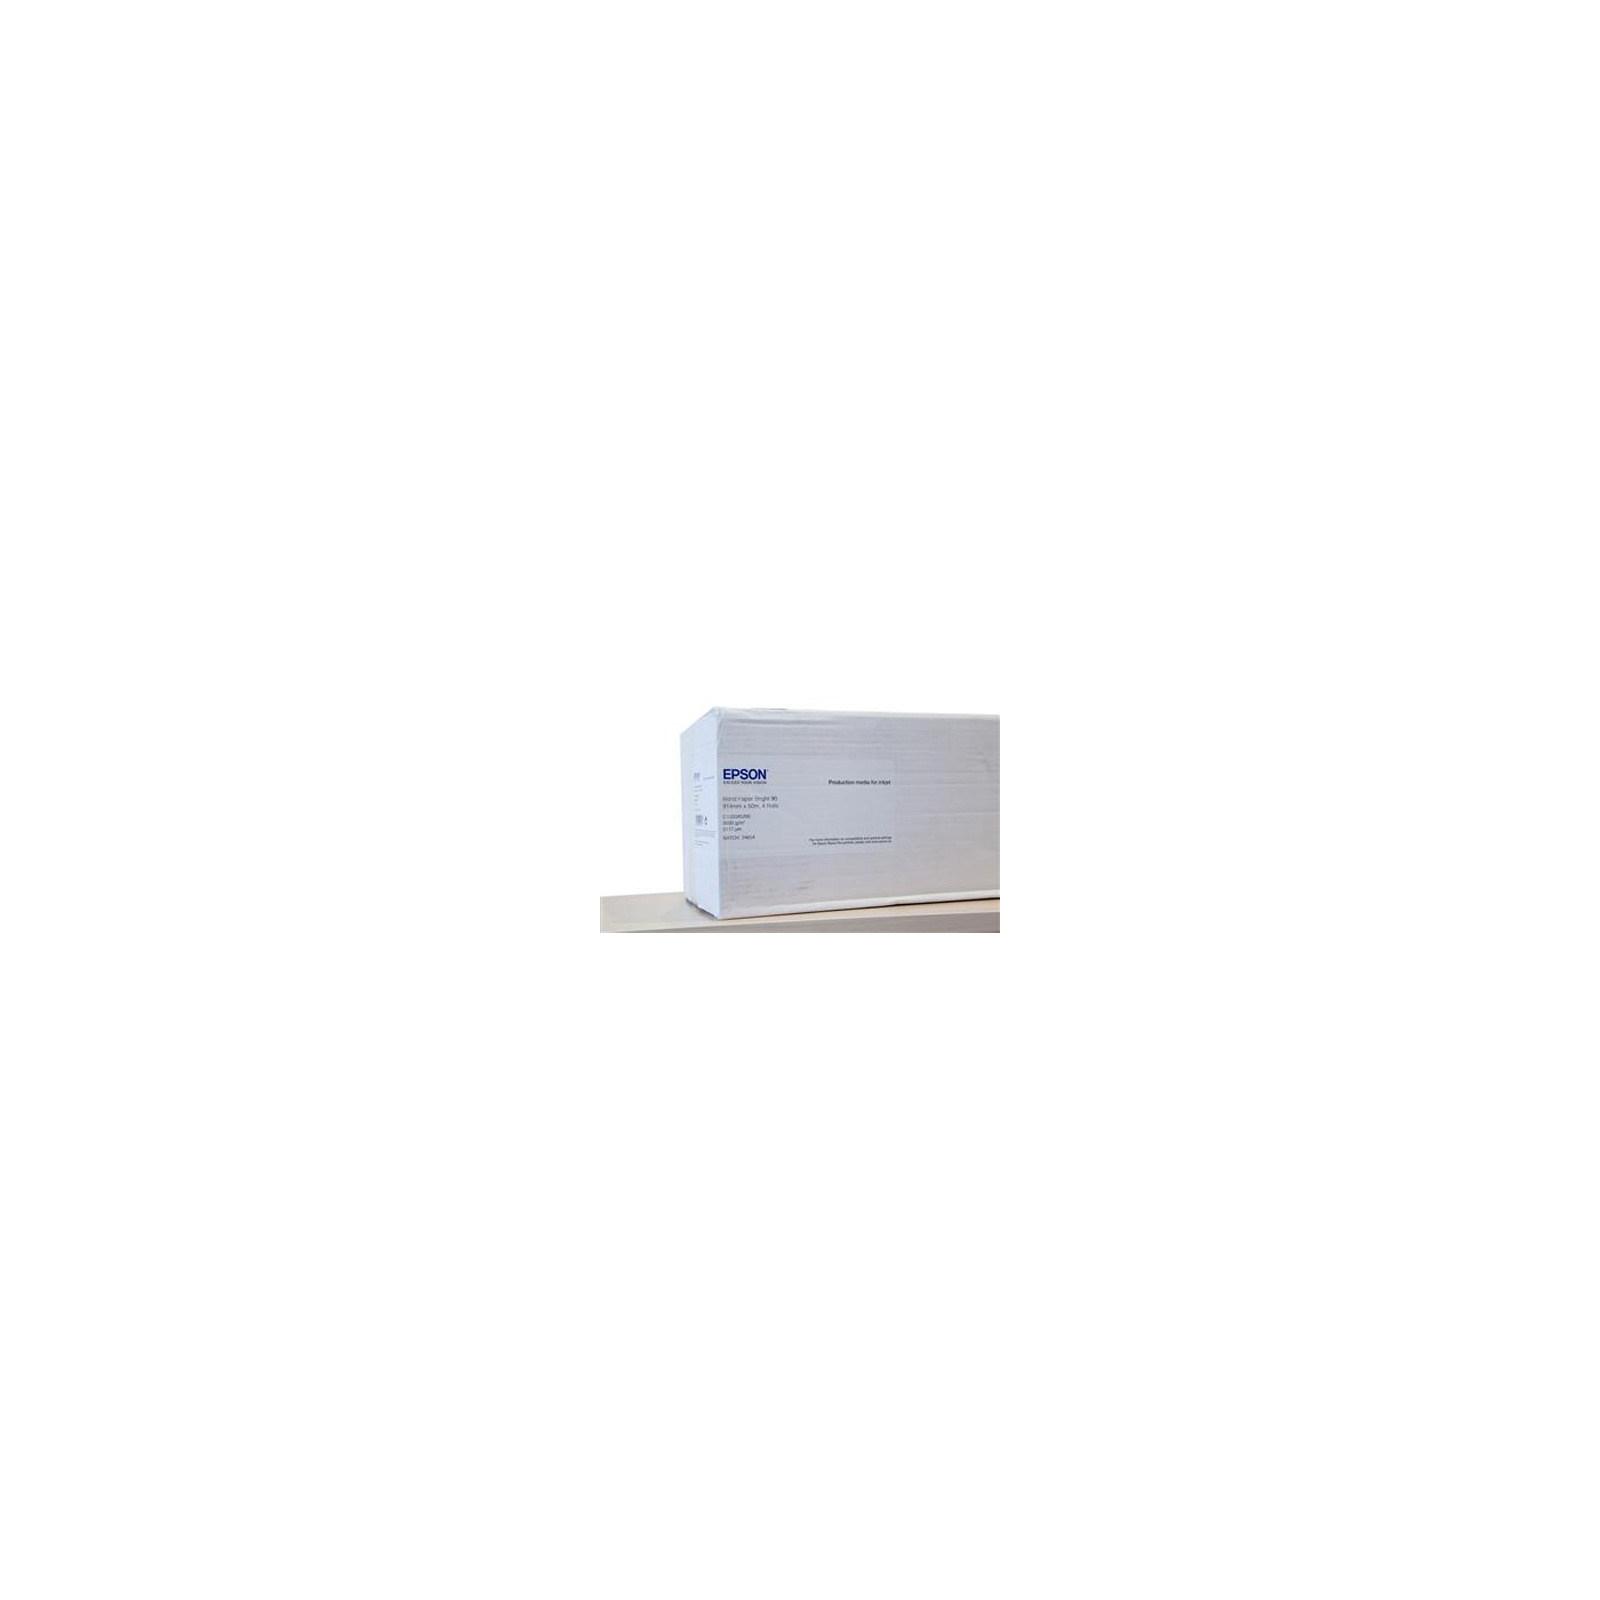 "Бумага EPSON 24"" Bond Paper White (C13S045273)"